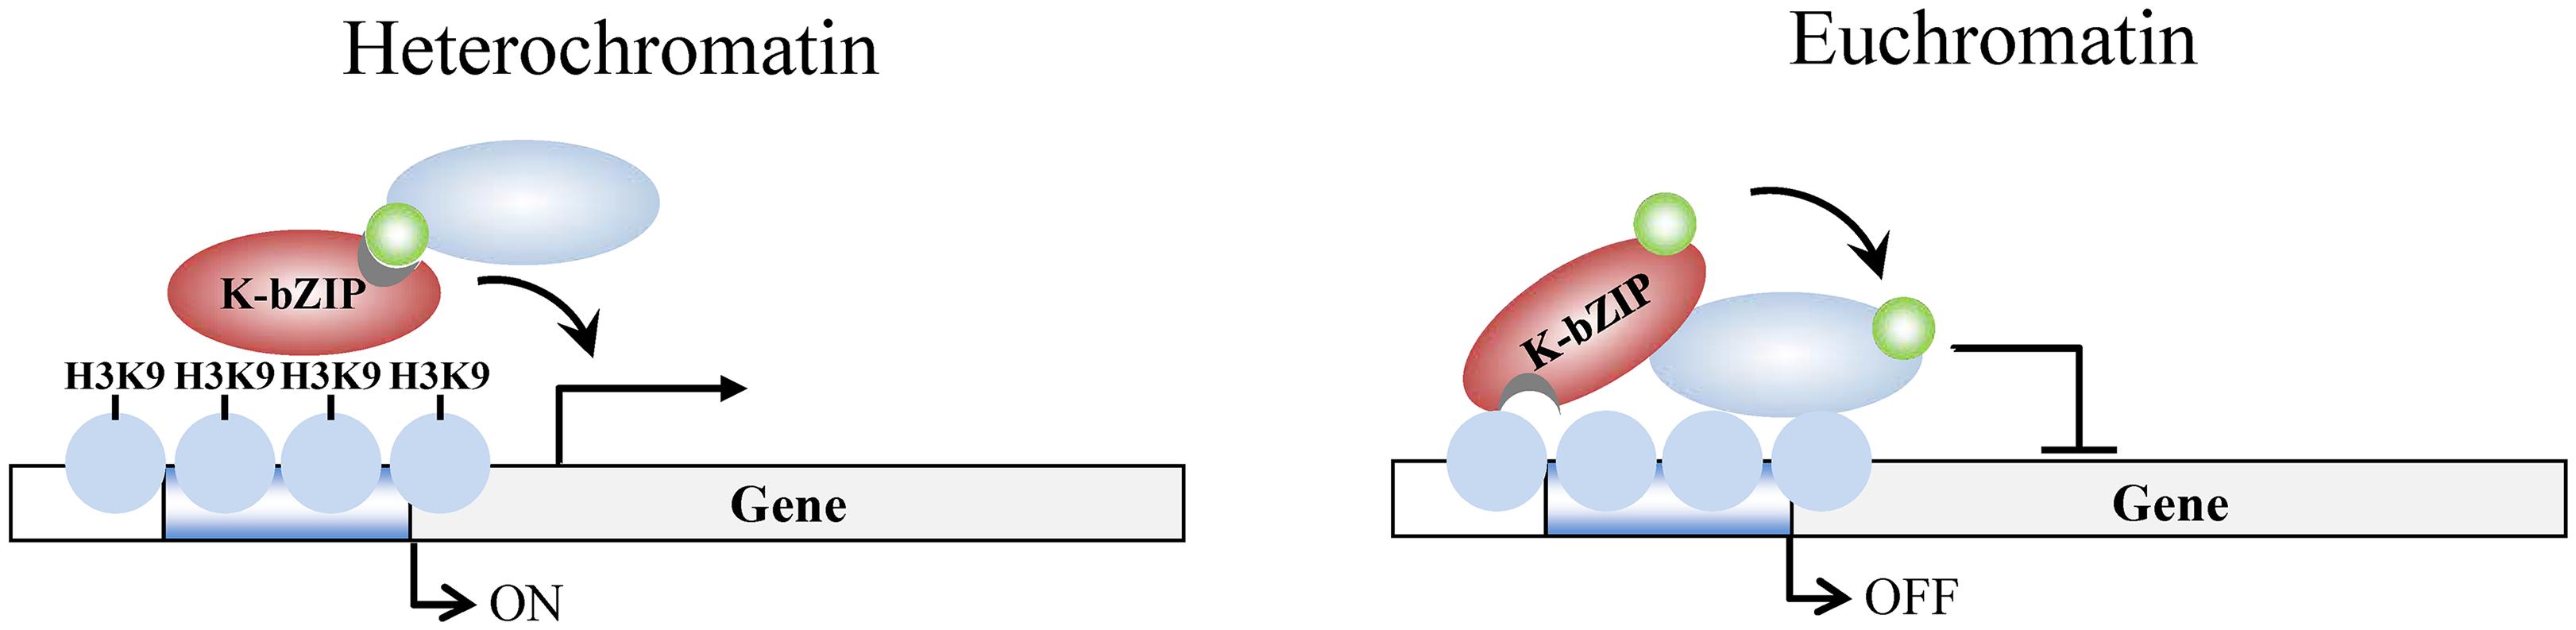 Model of K-bZIP regulation of viral gene expression in heterochromatin and euchromatin regions of the KSHV genome during reactivation.